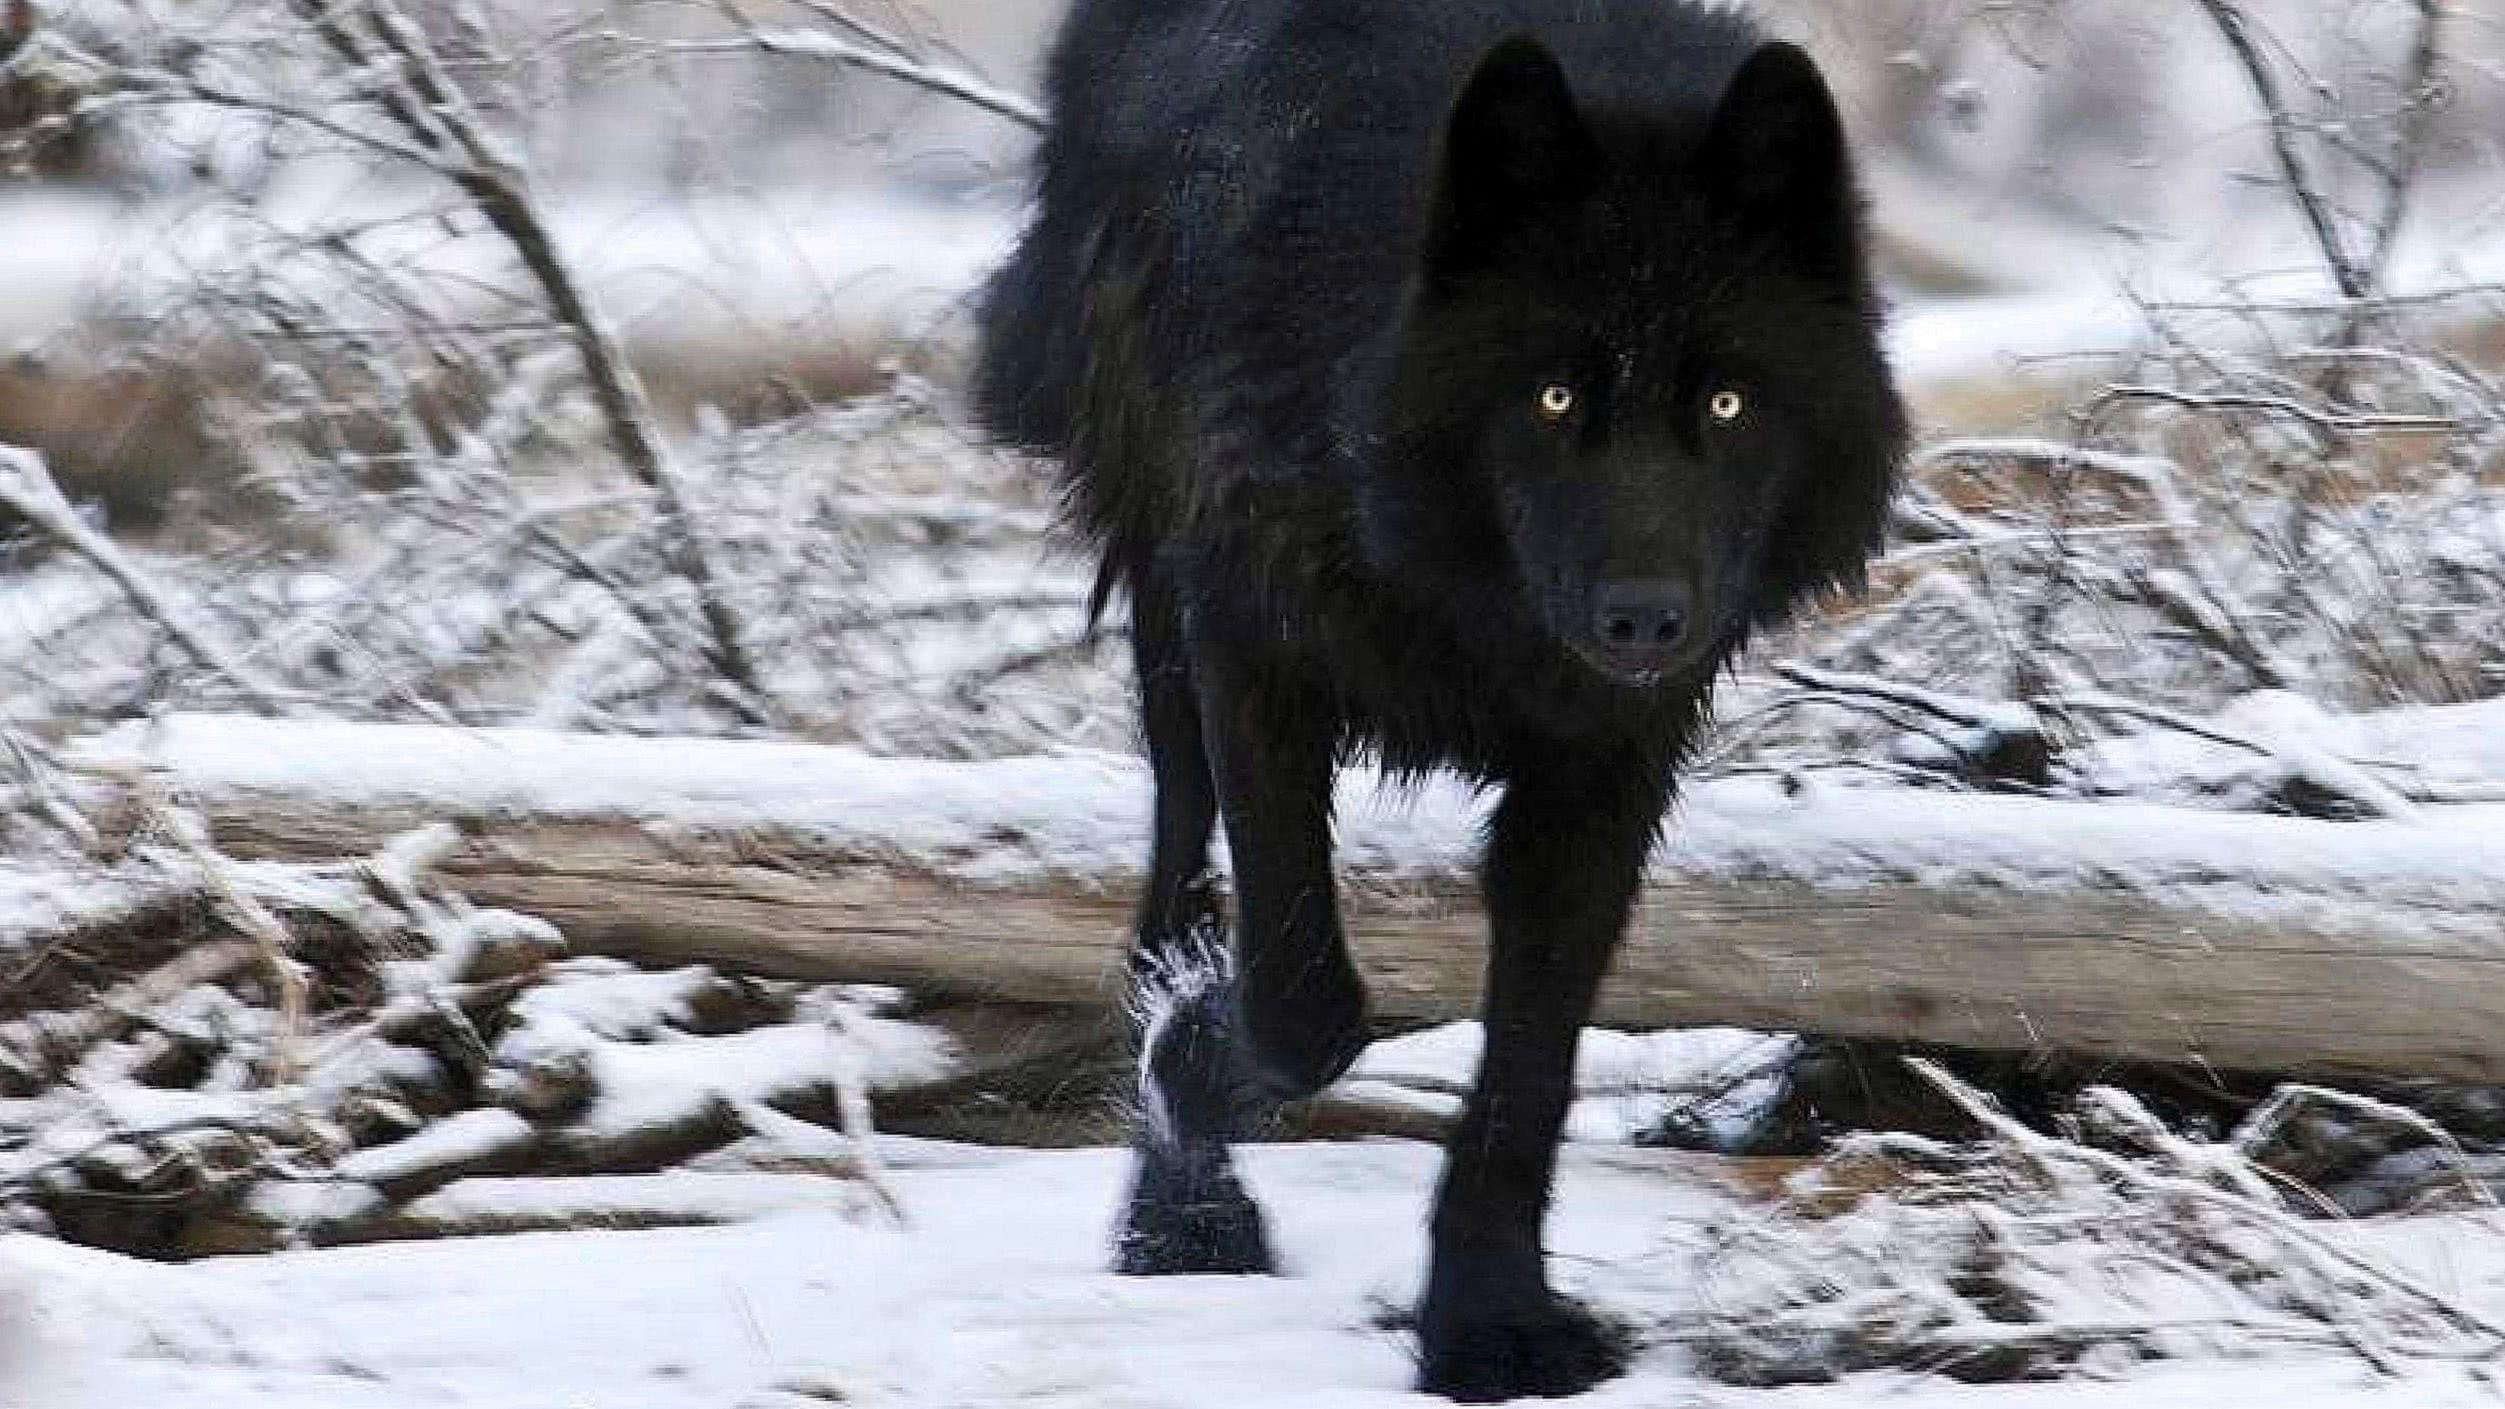 HD Wolf Wallpaper 1080p